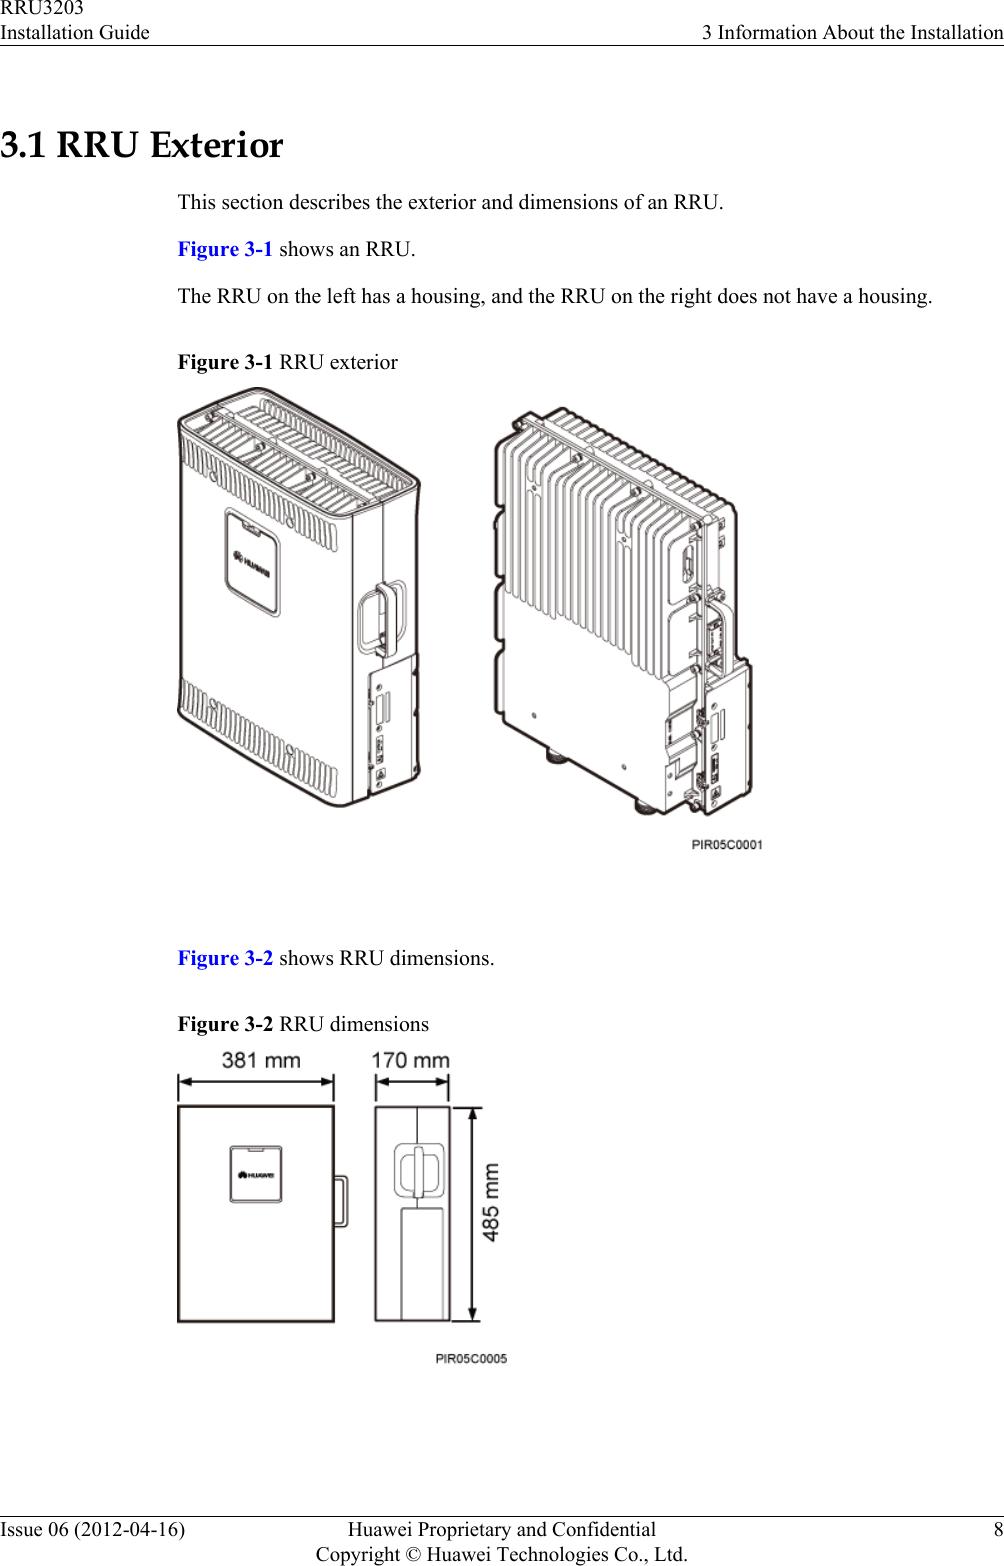 Huawei Technologies RRU3203-B12 Remote Radio Unit User